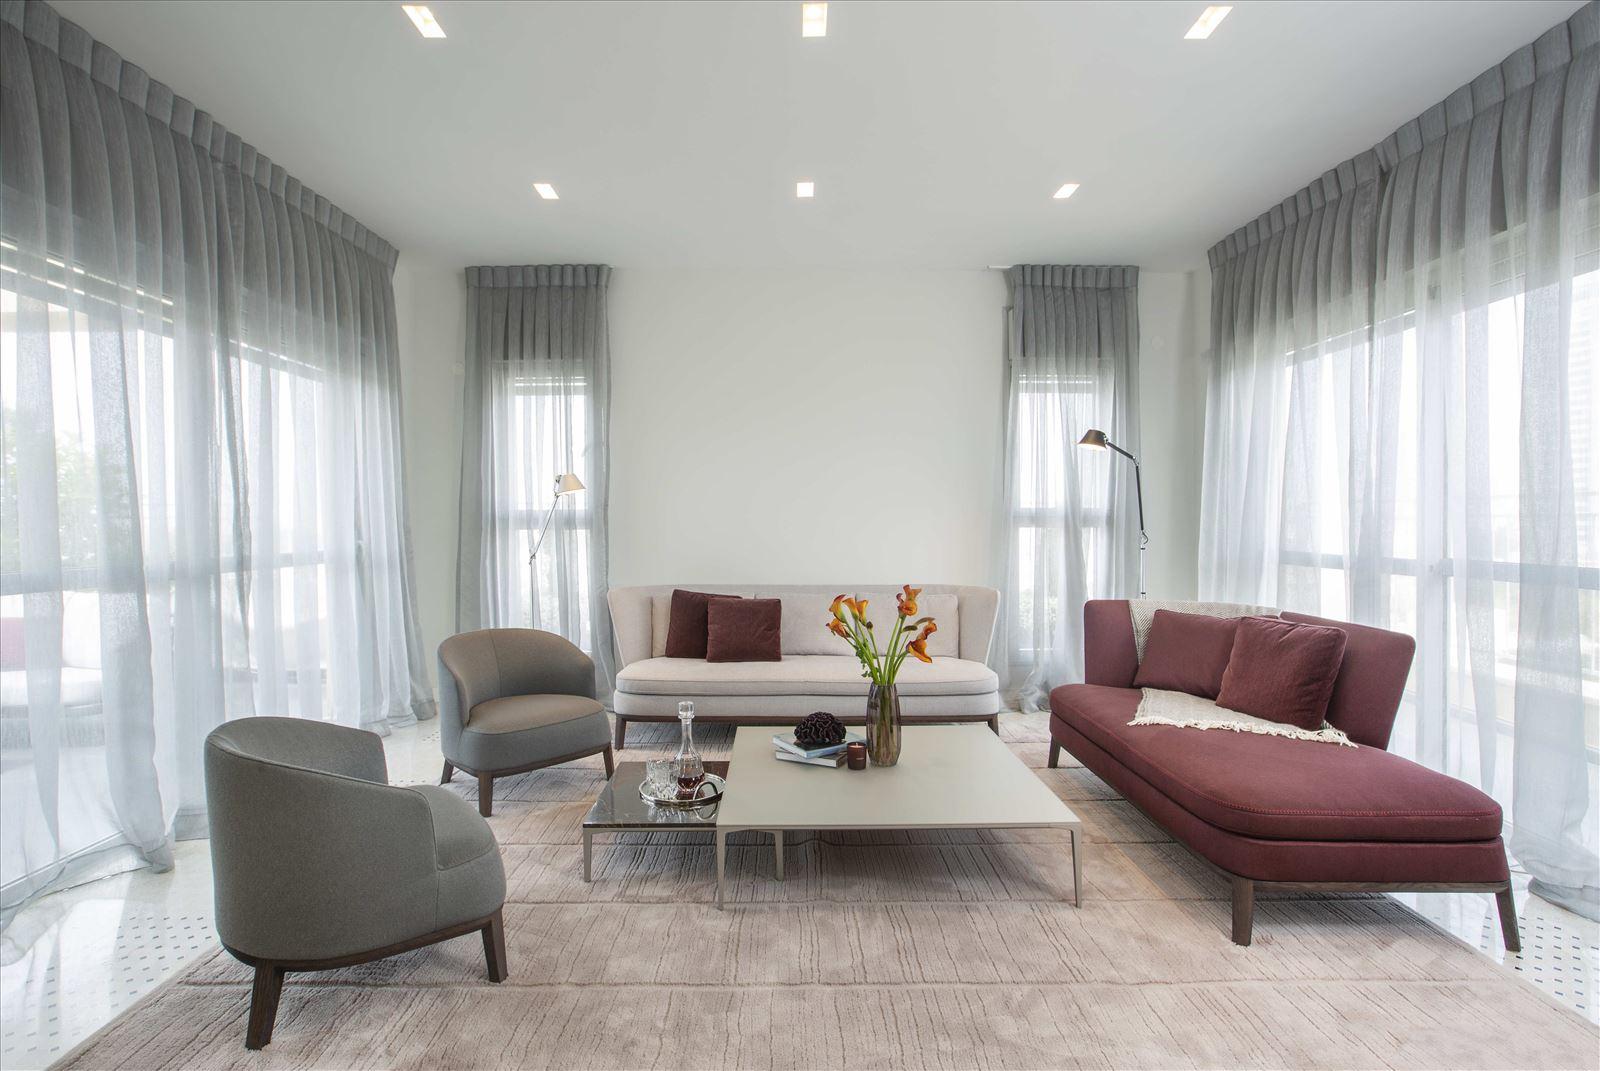 Tel Aviv apartment in Parisian aroma כל התאורה בסלון על ידי קמחי תאורה